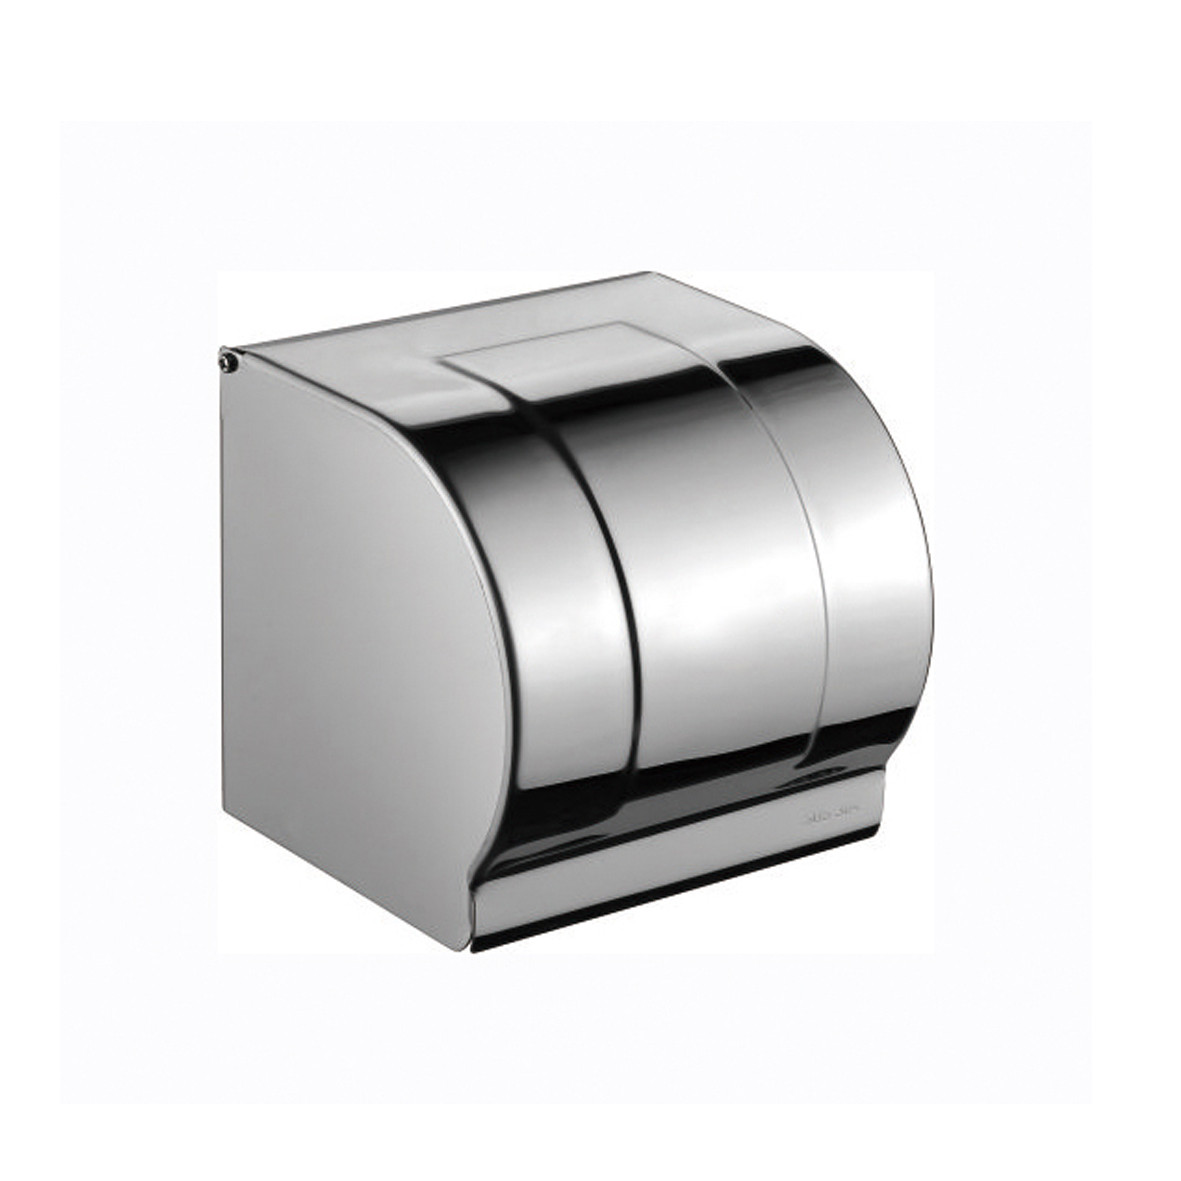 Диспенсер для туалетной бумаги HOTEC 16.623 Stainless Steel